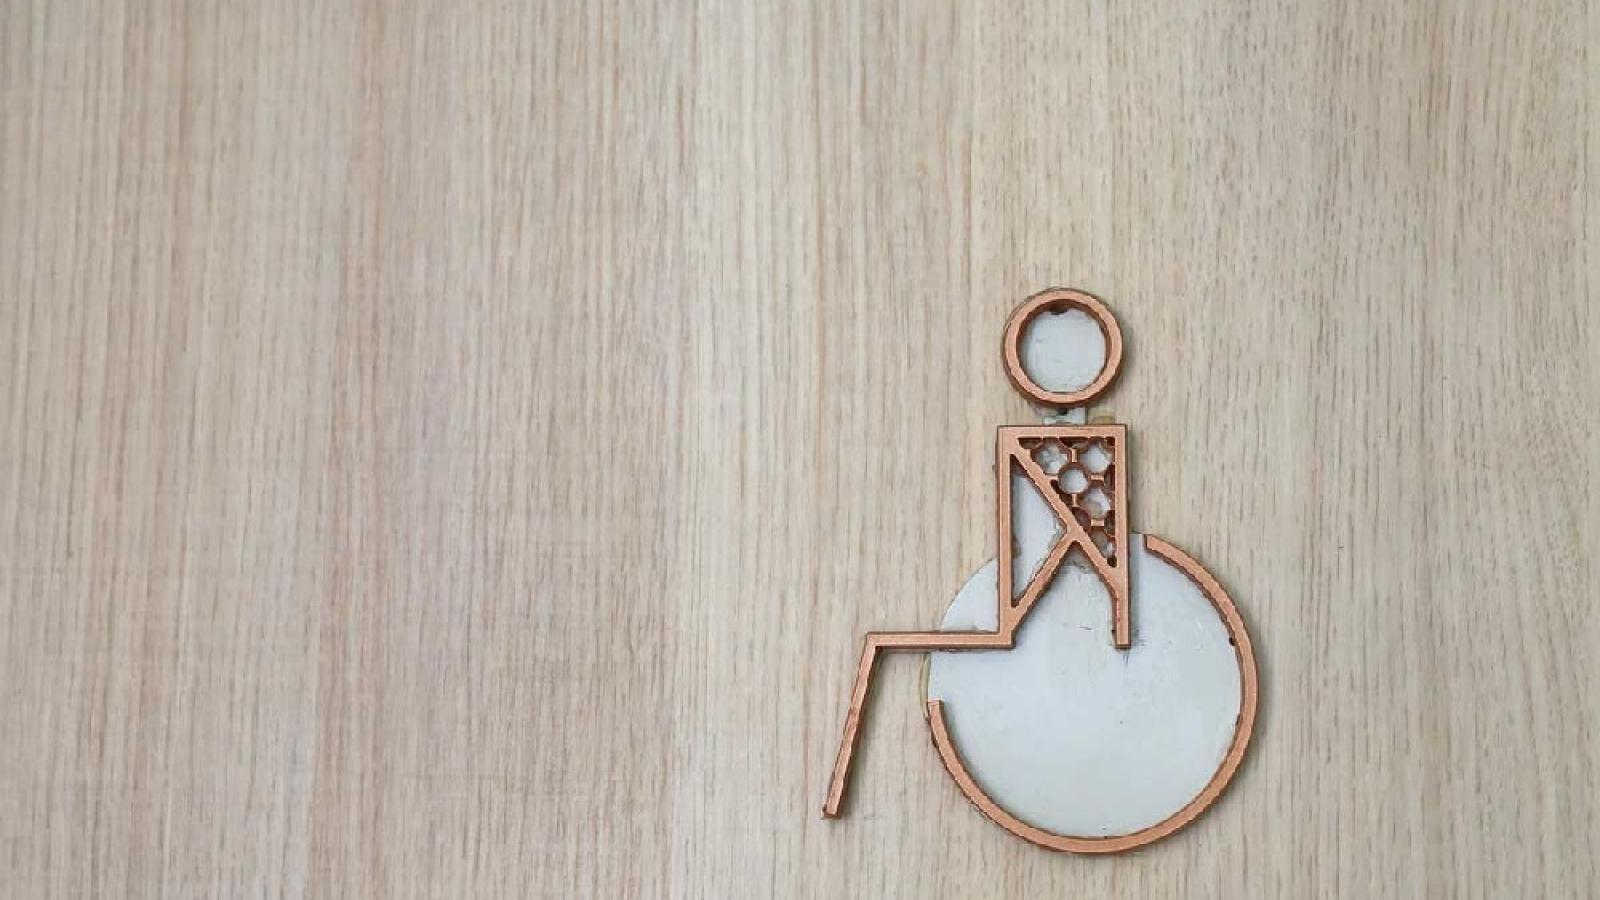 How to Modify a Bathroom to Make It Senior-Friendly